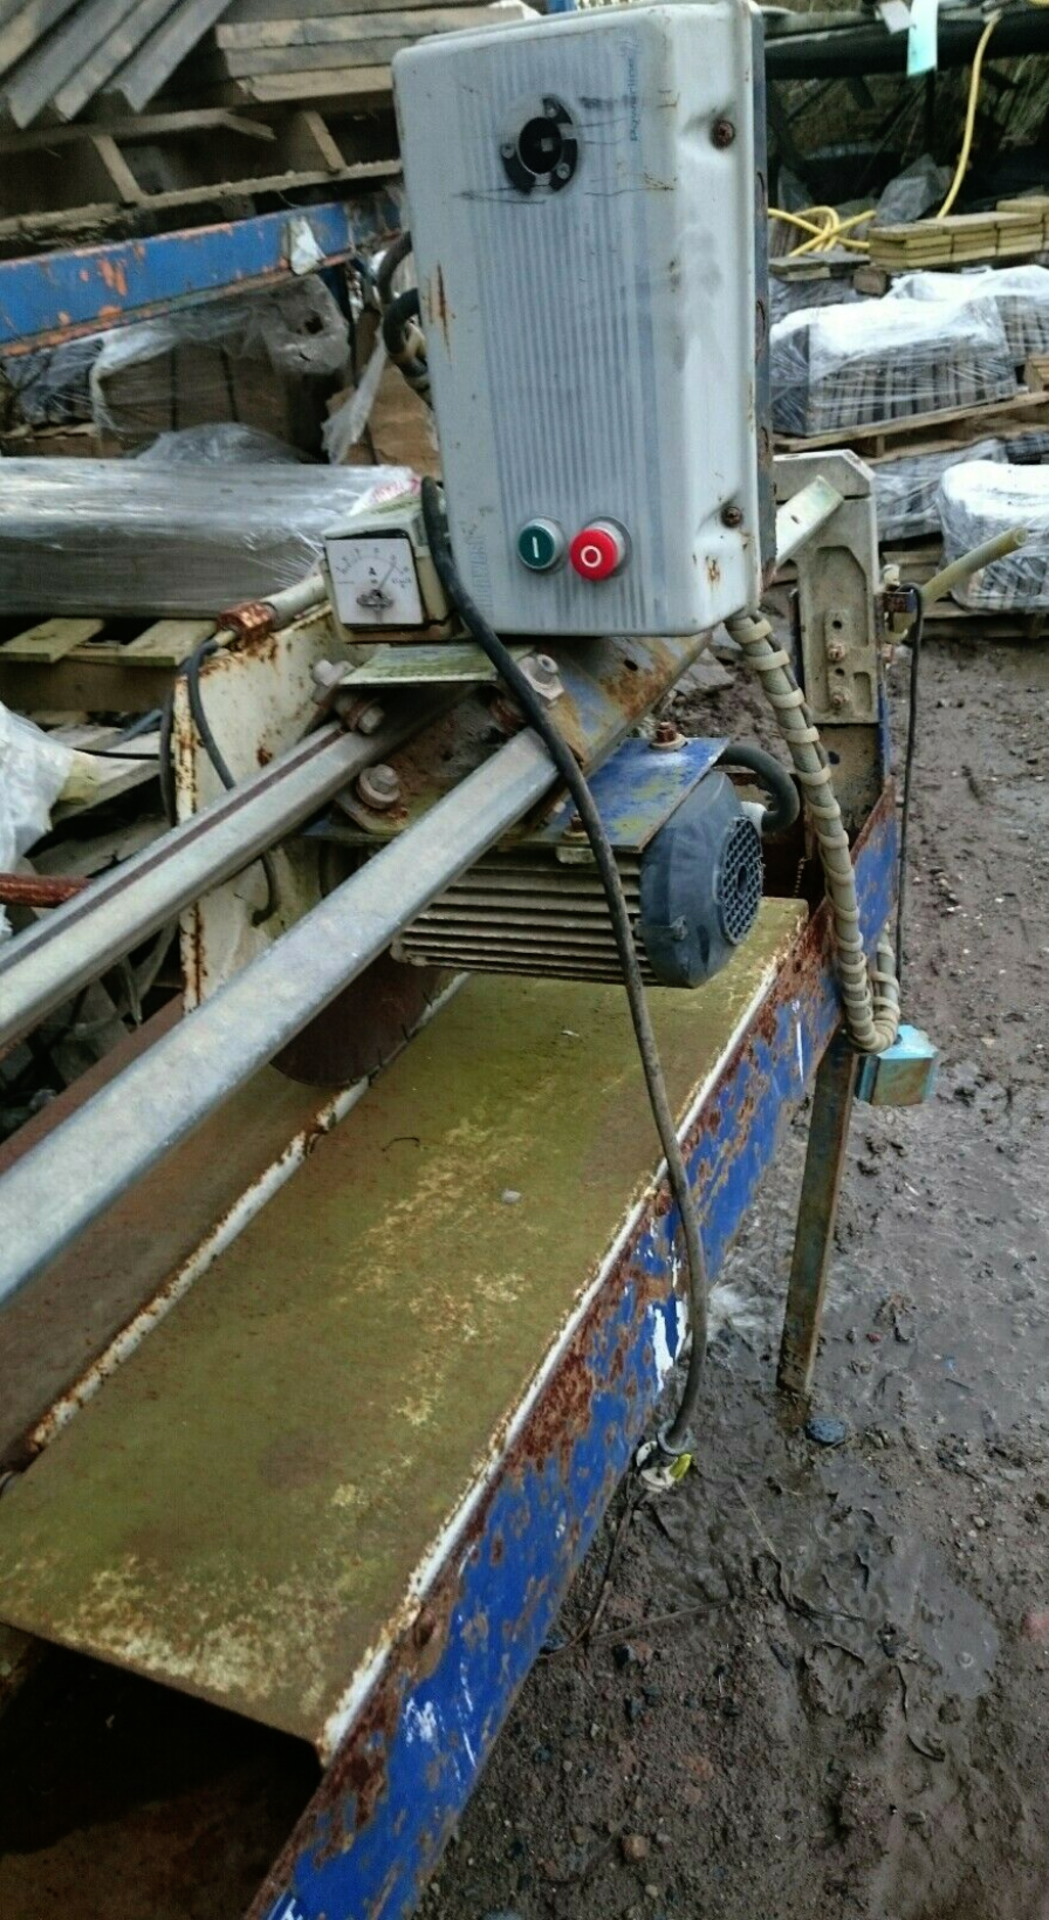 Lot 64 - DIAMANT BOART TS350L BRIDGE SAW FOR CUTTING TILES, STONE ETC 110V